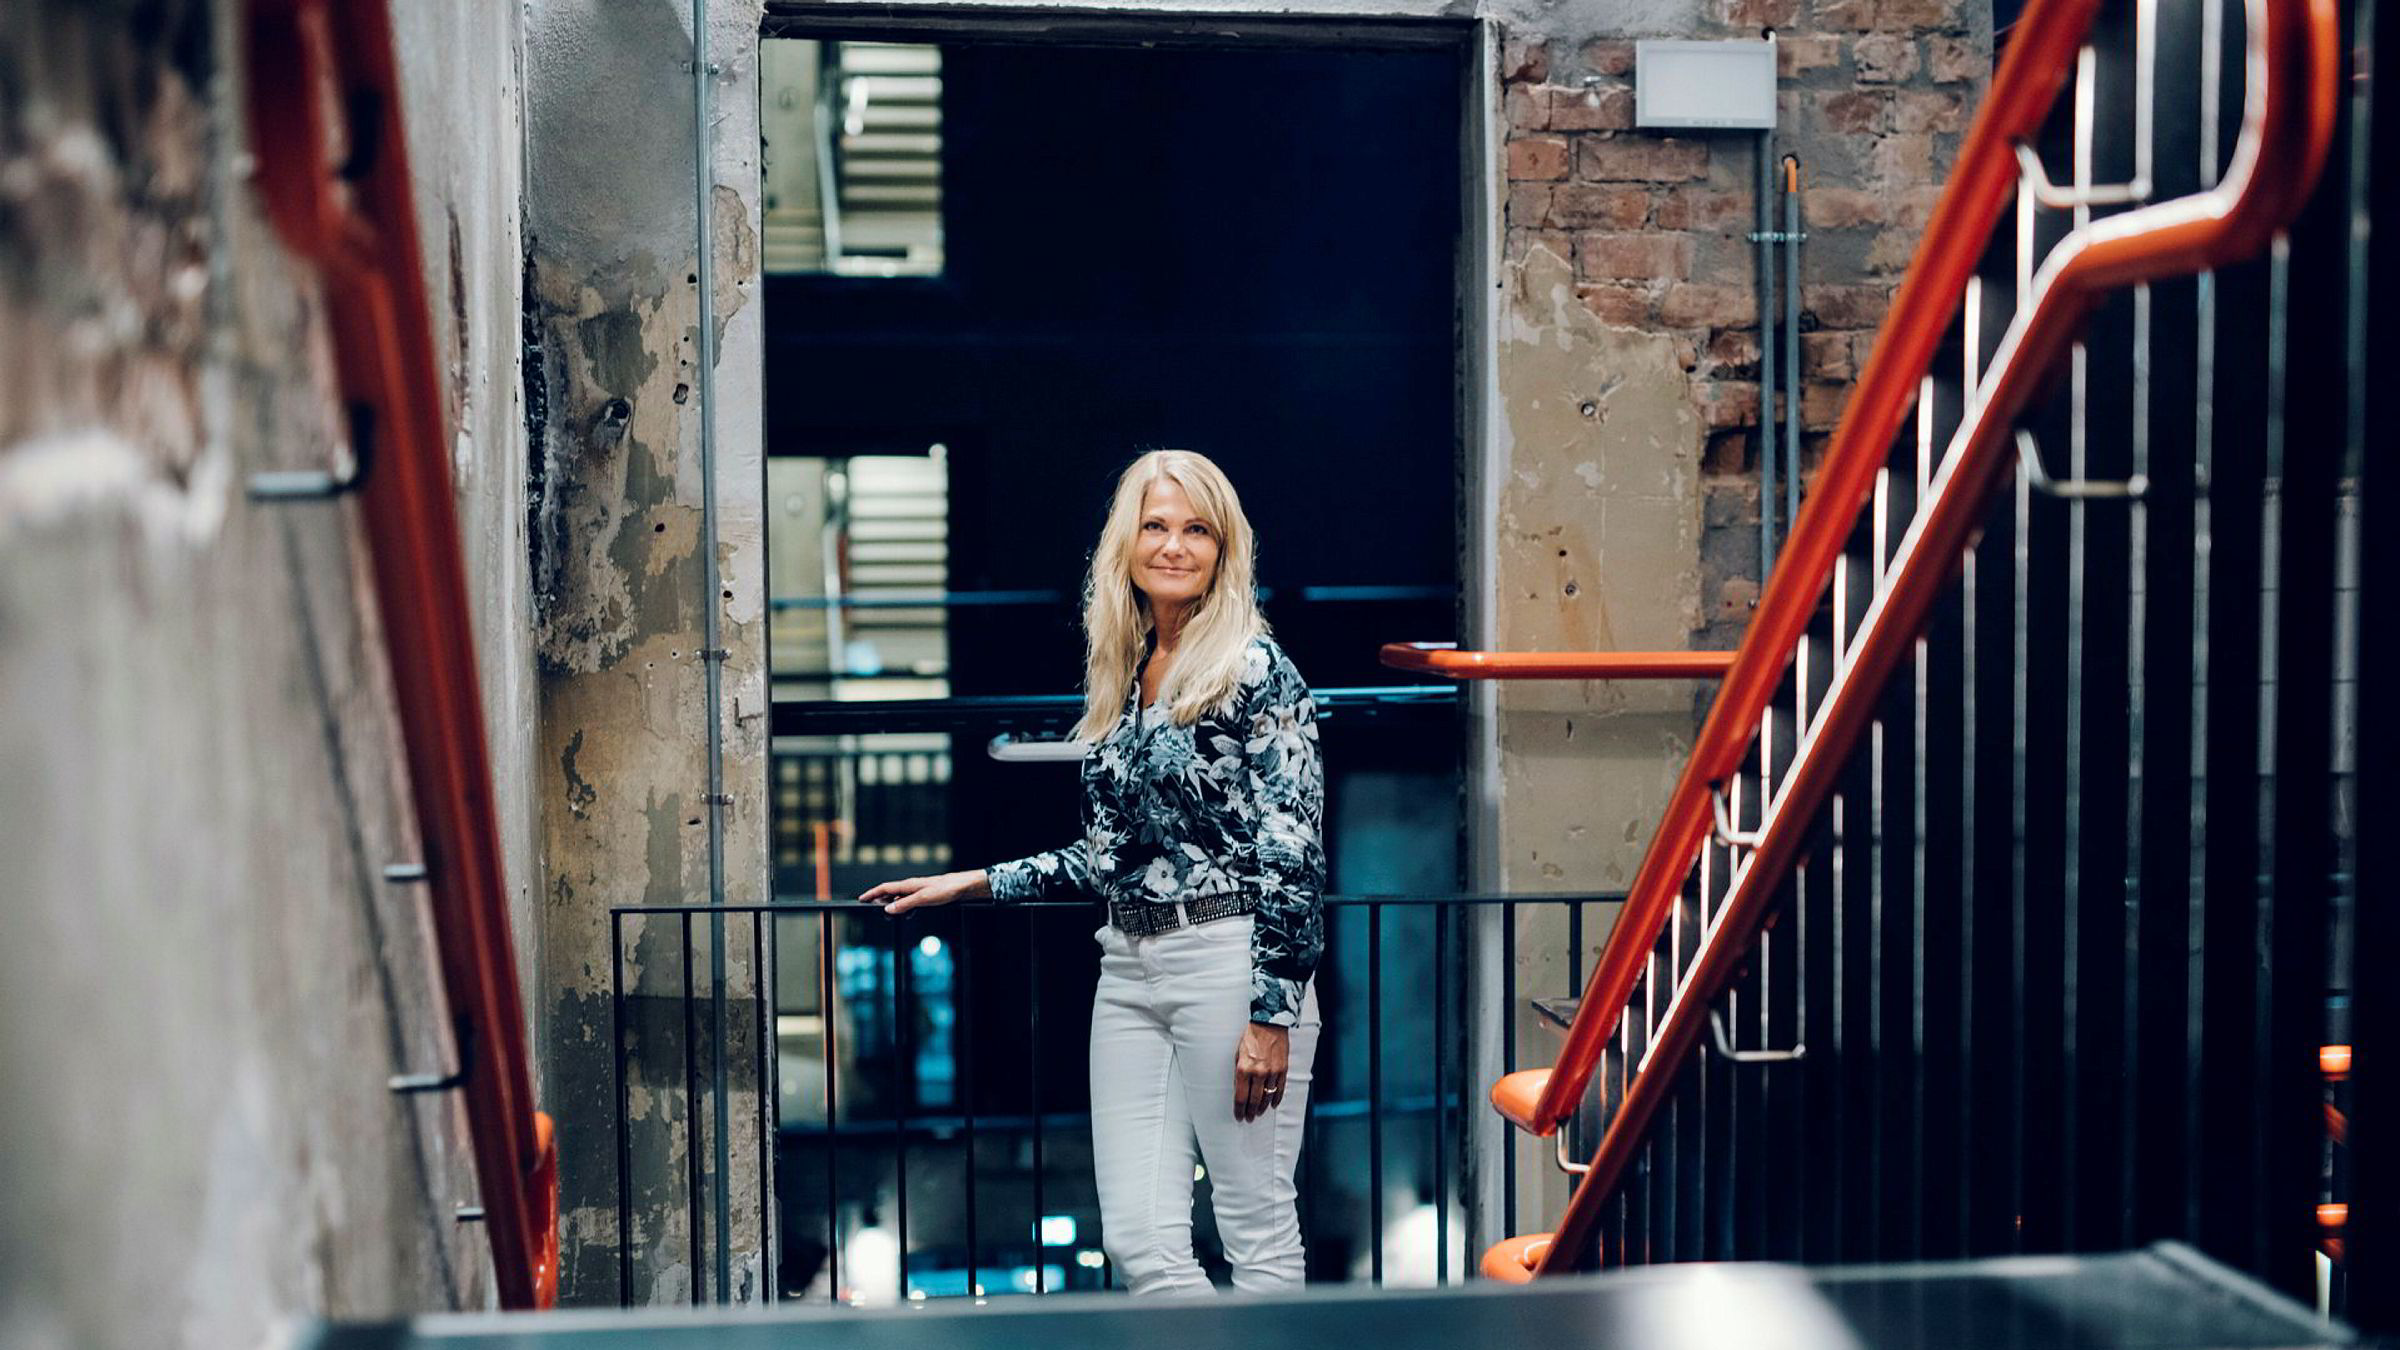 Det første mediebarometeret for året fra Merete Mandt Larsen og Mediebyråforeningen viser en samlet vekst på 4,5 prosent i reklameomsetningen for norske medier.